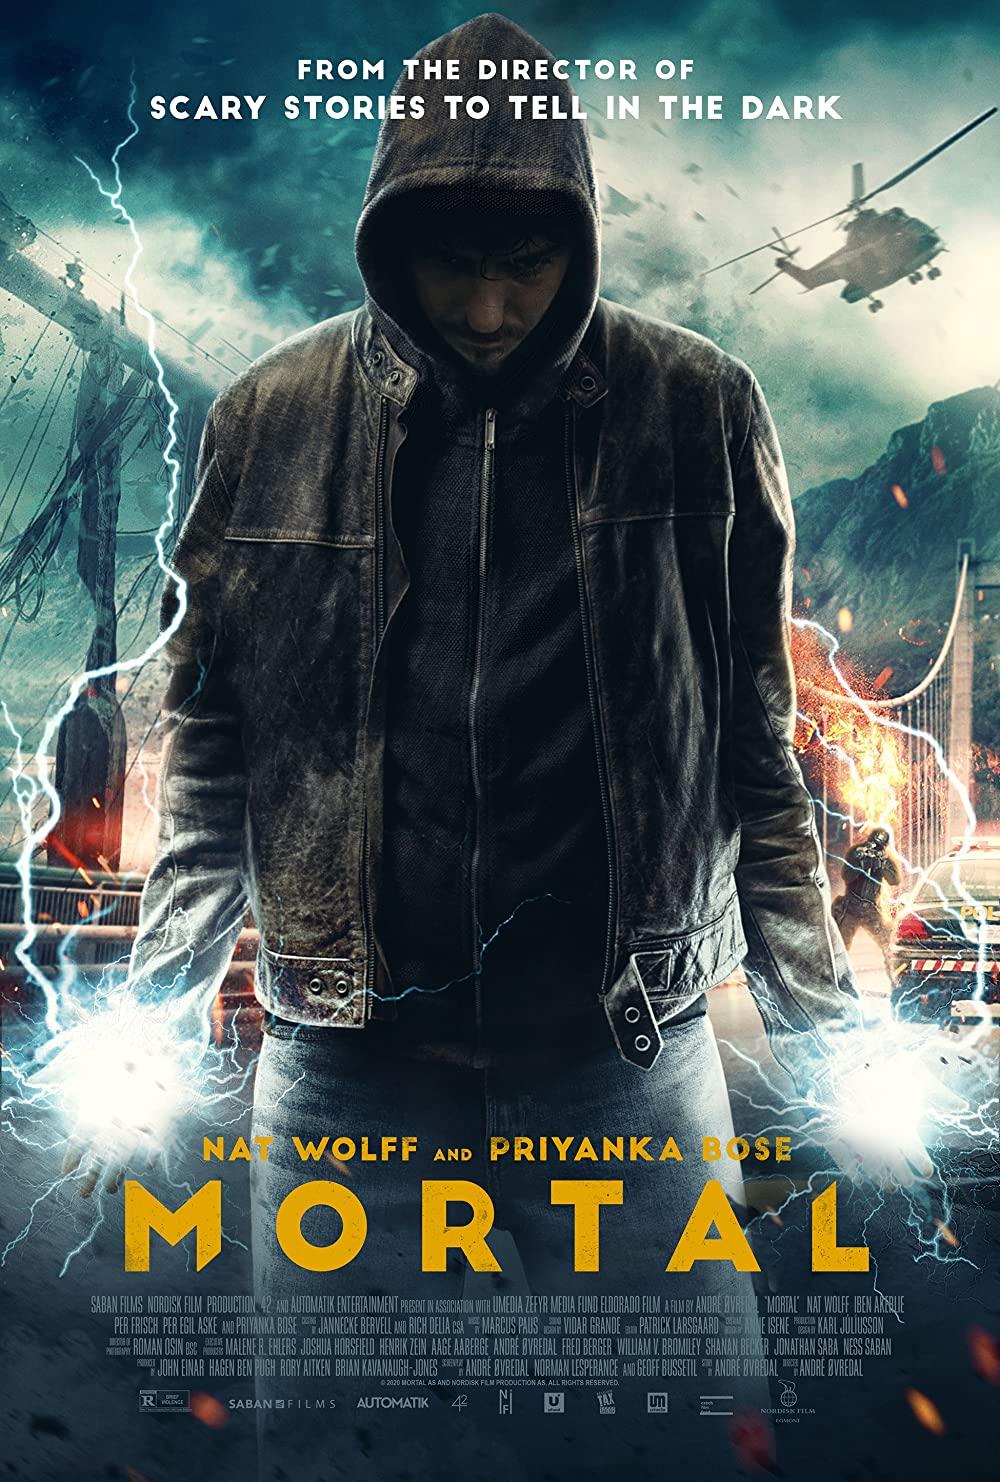 Poster for Mortal